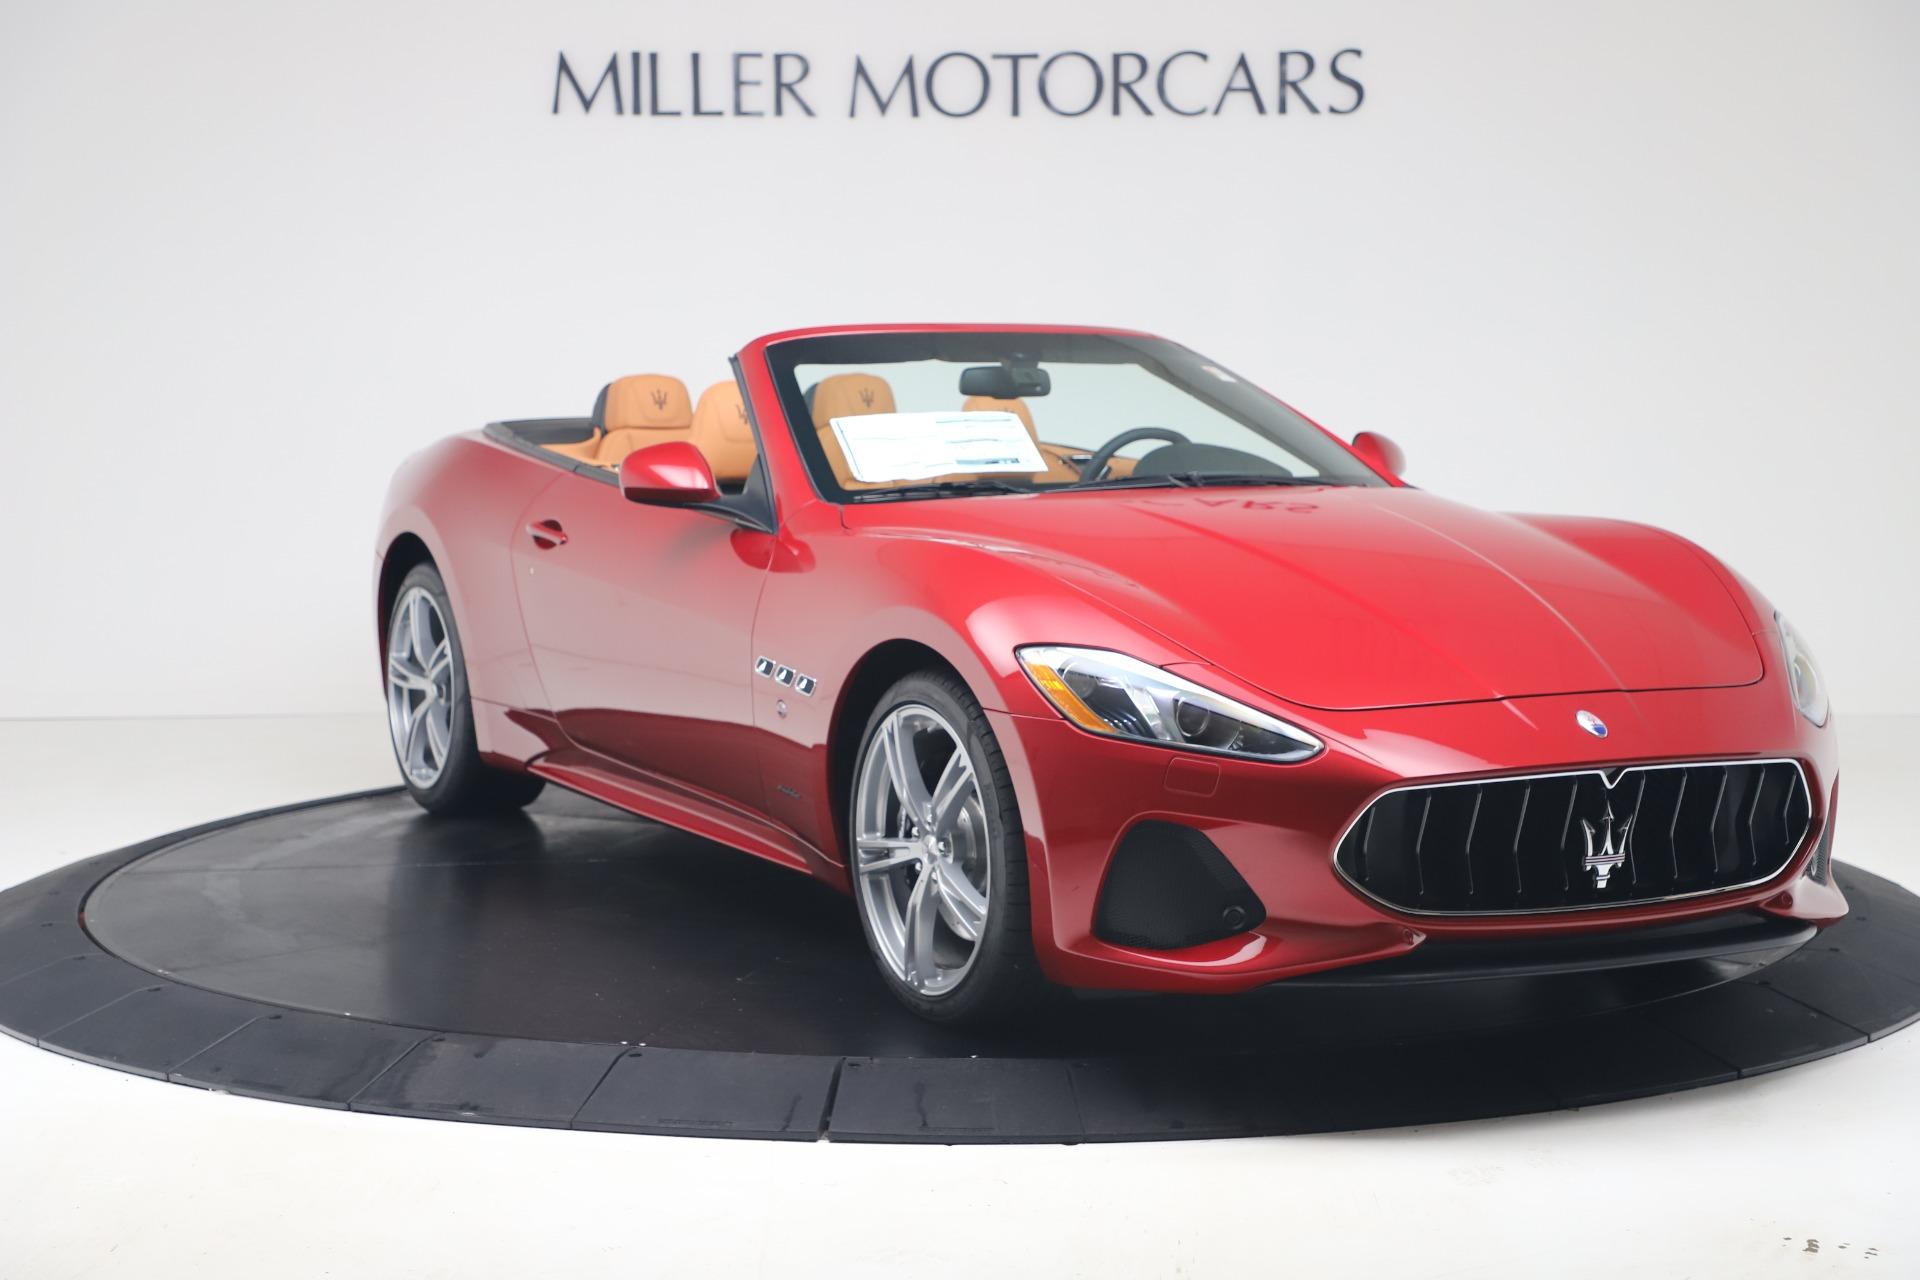 New 2019 Maserati GranTurismo Sport For Sale ($162,520)   Miller Motorcars Stock #W717